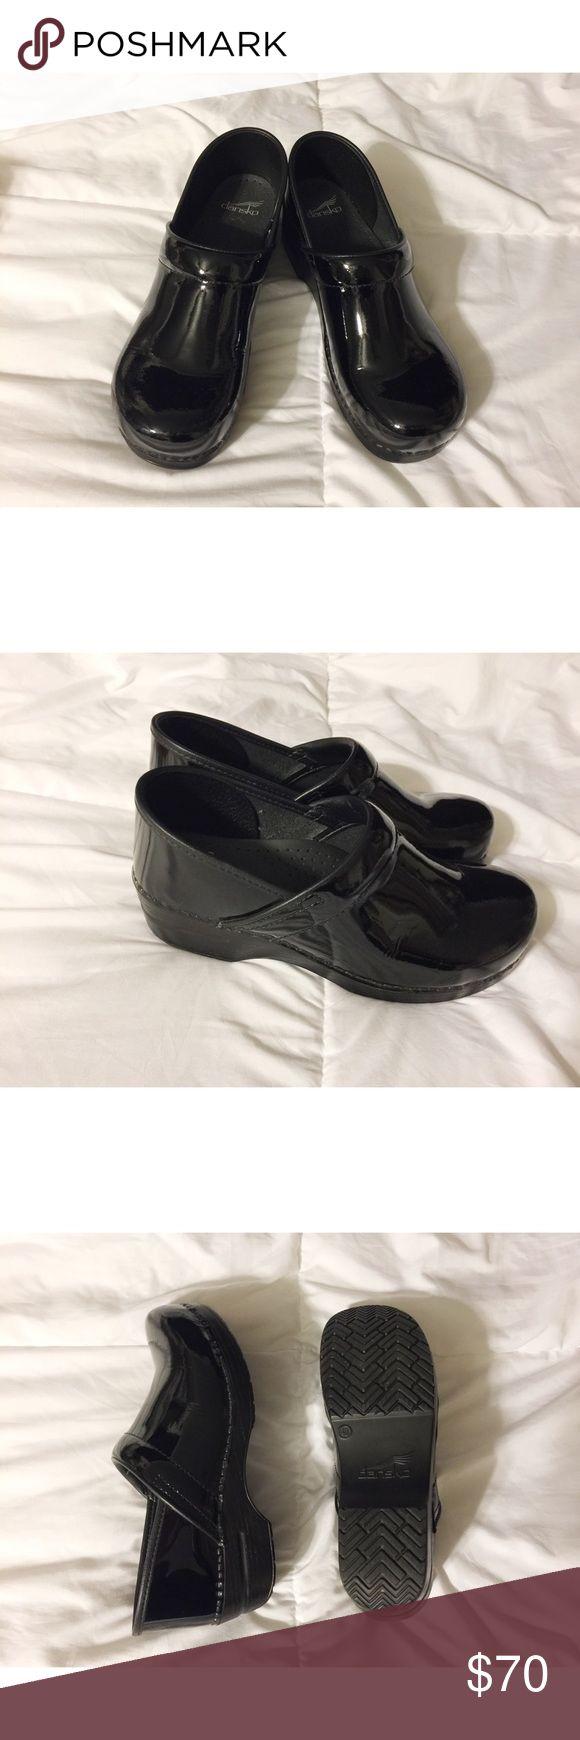 Dansko Black Patent Leather Professional Clogs Like new! Never worn. Dansko Shoes Mules & Clogs